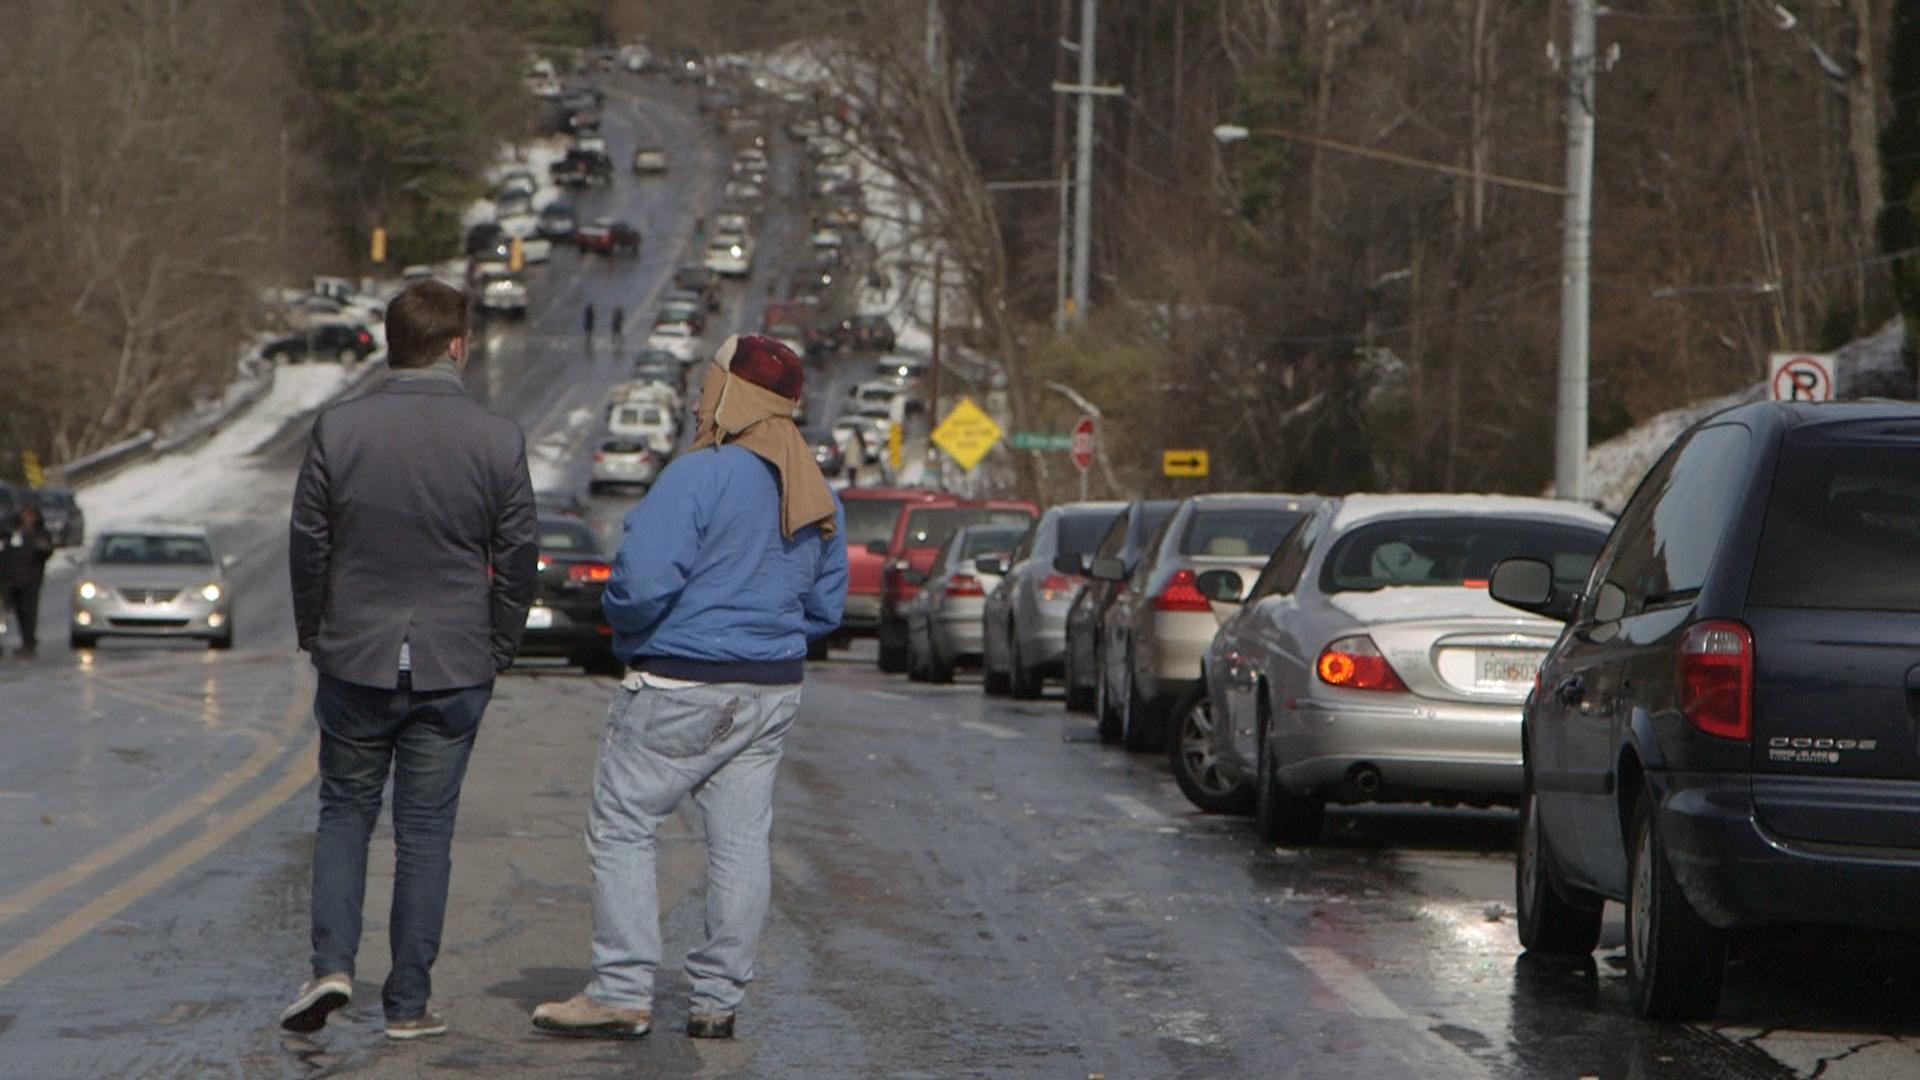 Atlantageddon: Snow response brings blowback